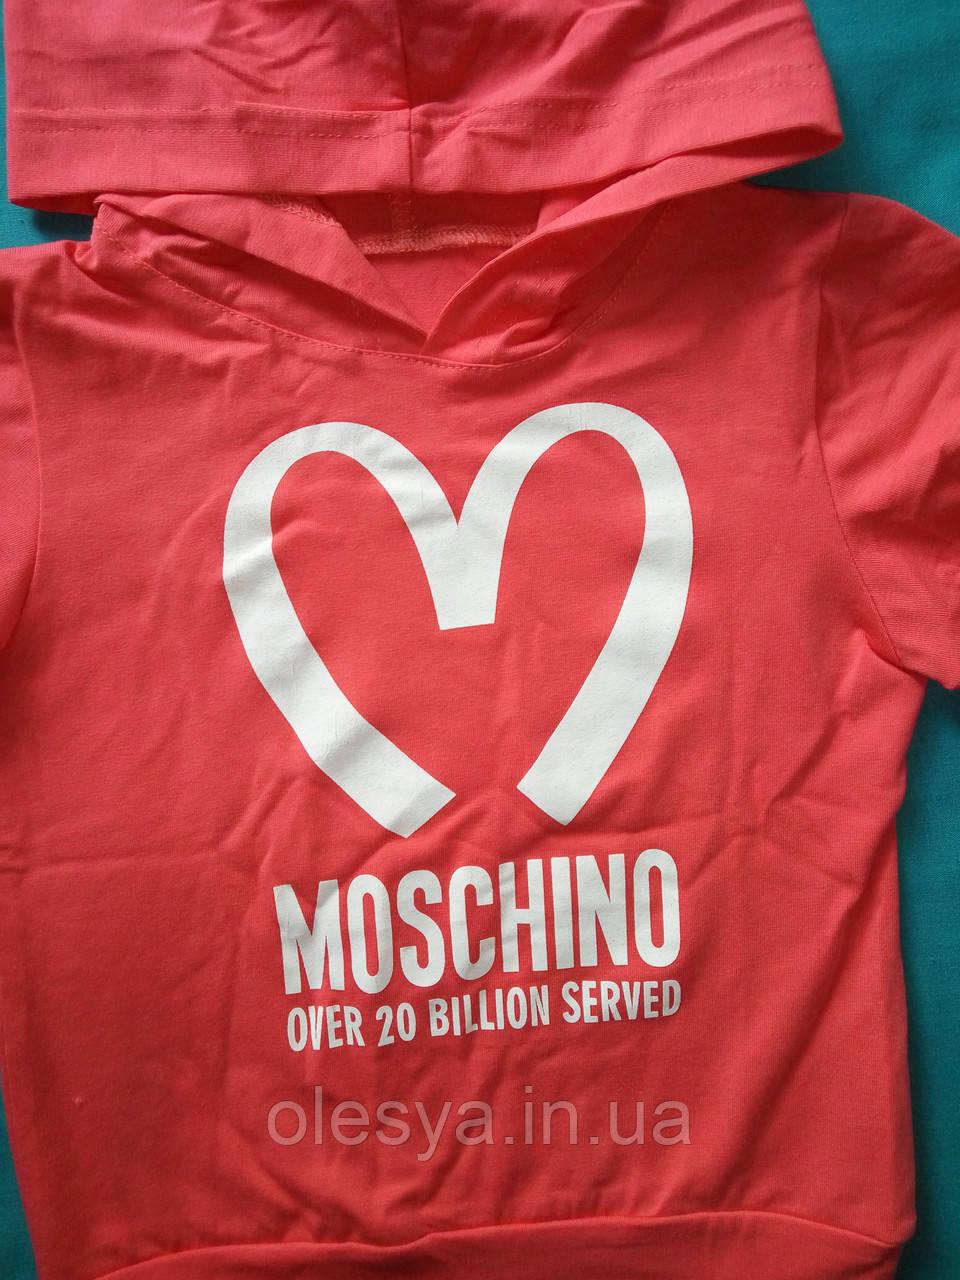 Летний комплект на девочку Moschino Туника бриджи Размер 110